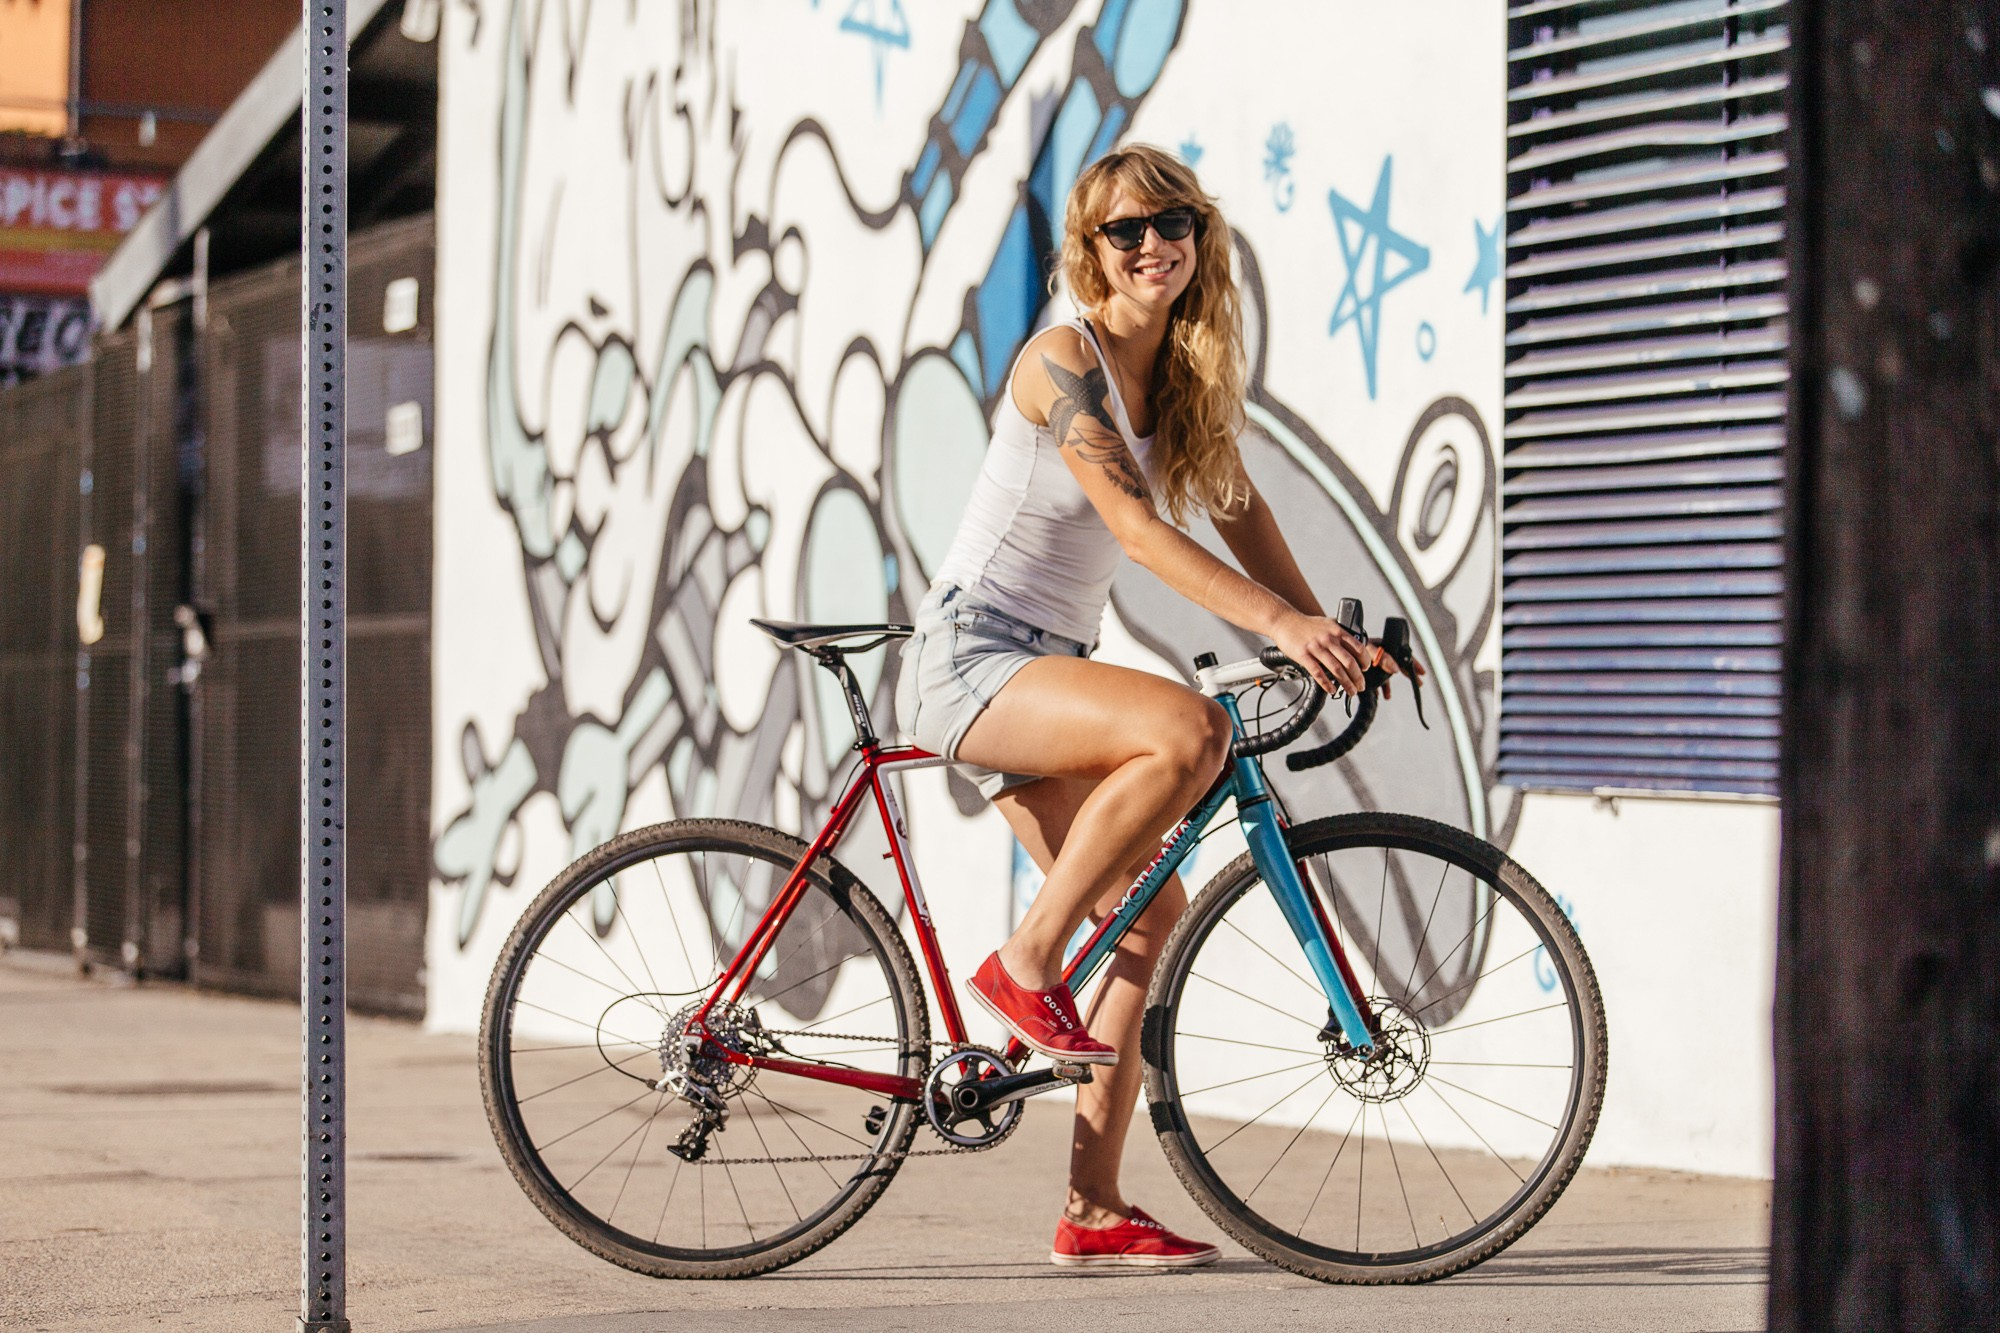 Ericas-Moth-Attack-CX-Team-Bike-31-1335x890@2x.jpg